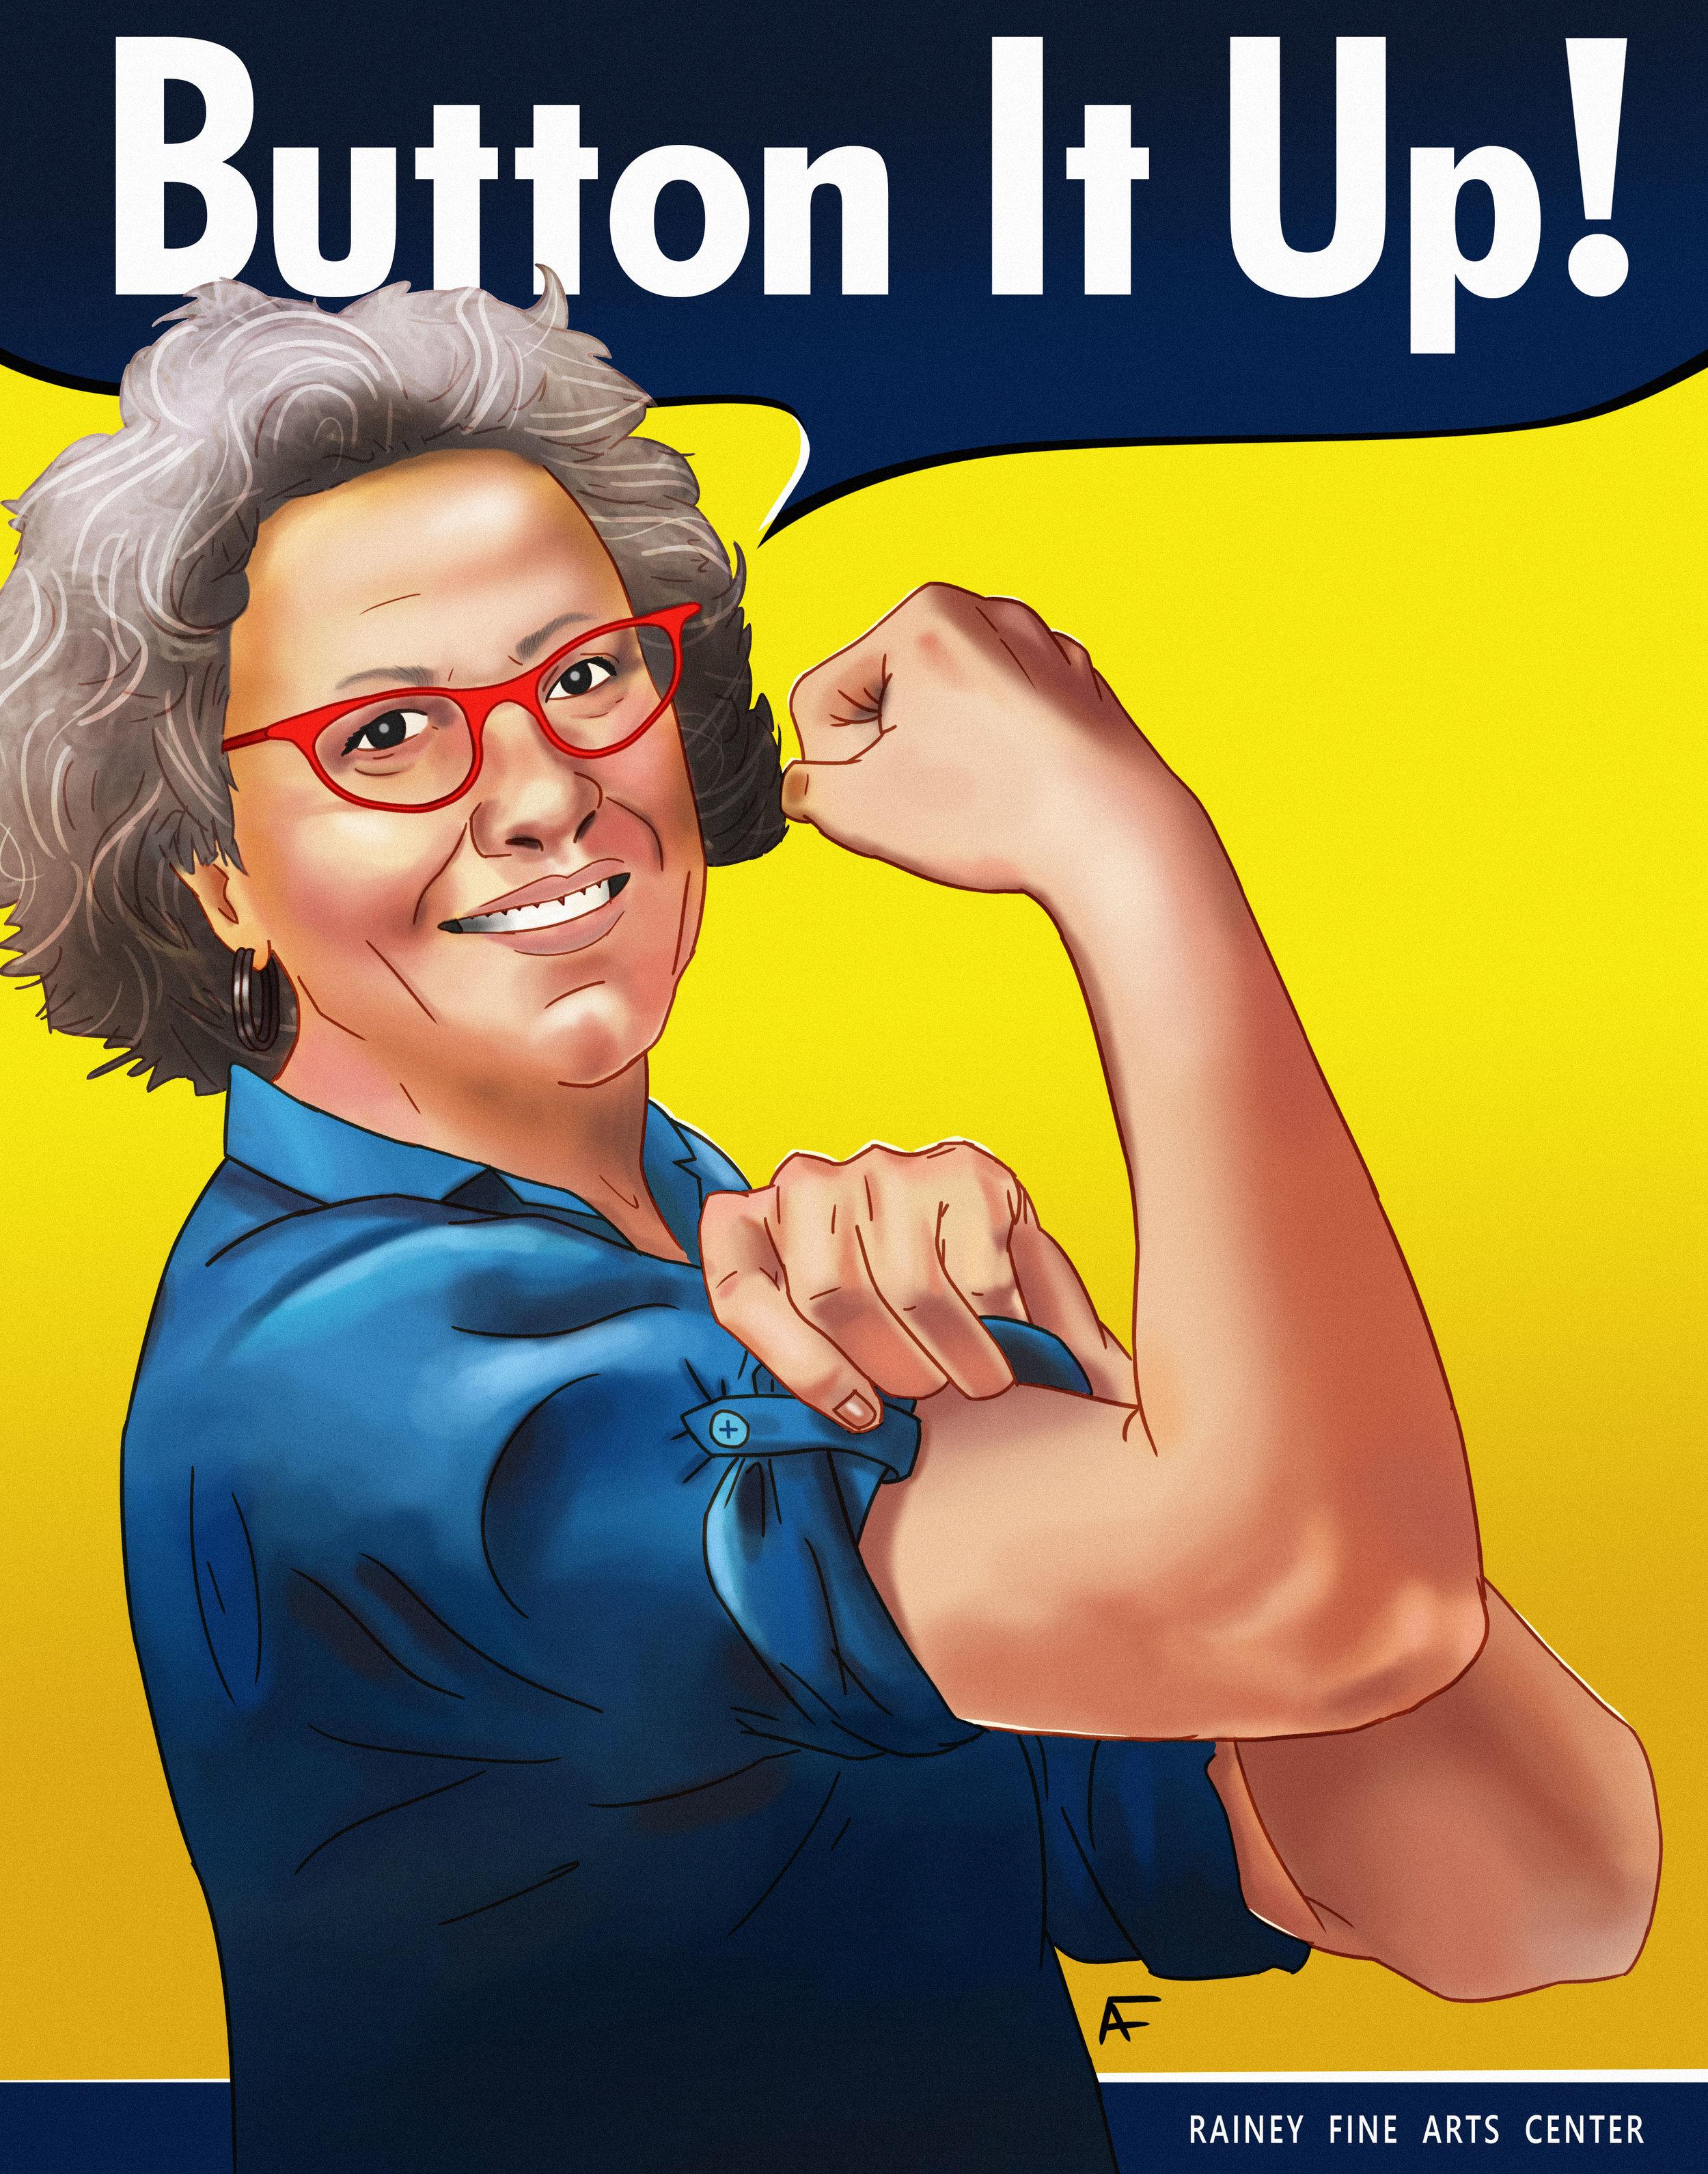 Frazier_Parody Professors Series_ Button It Up!_Digital Art_11inx14in.jpg